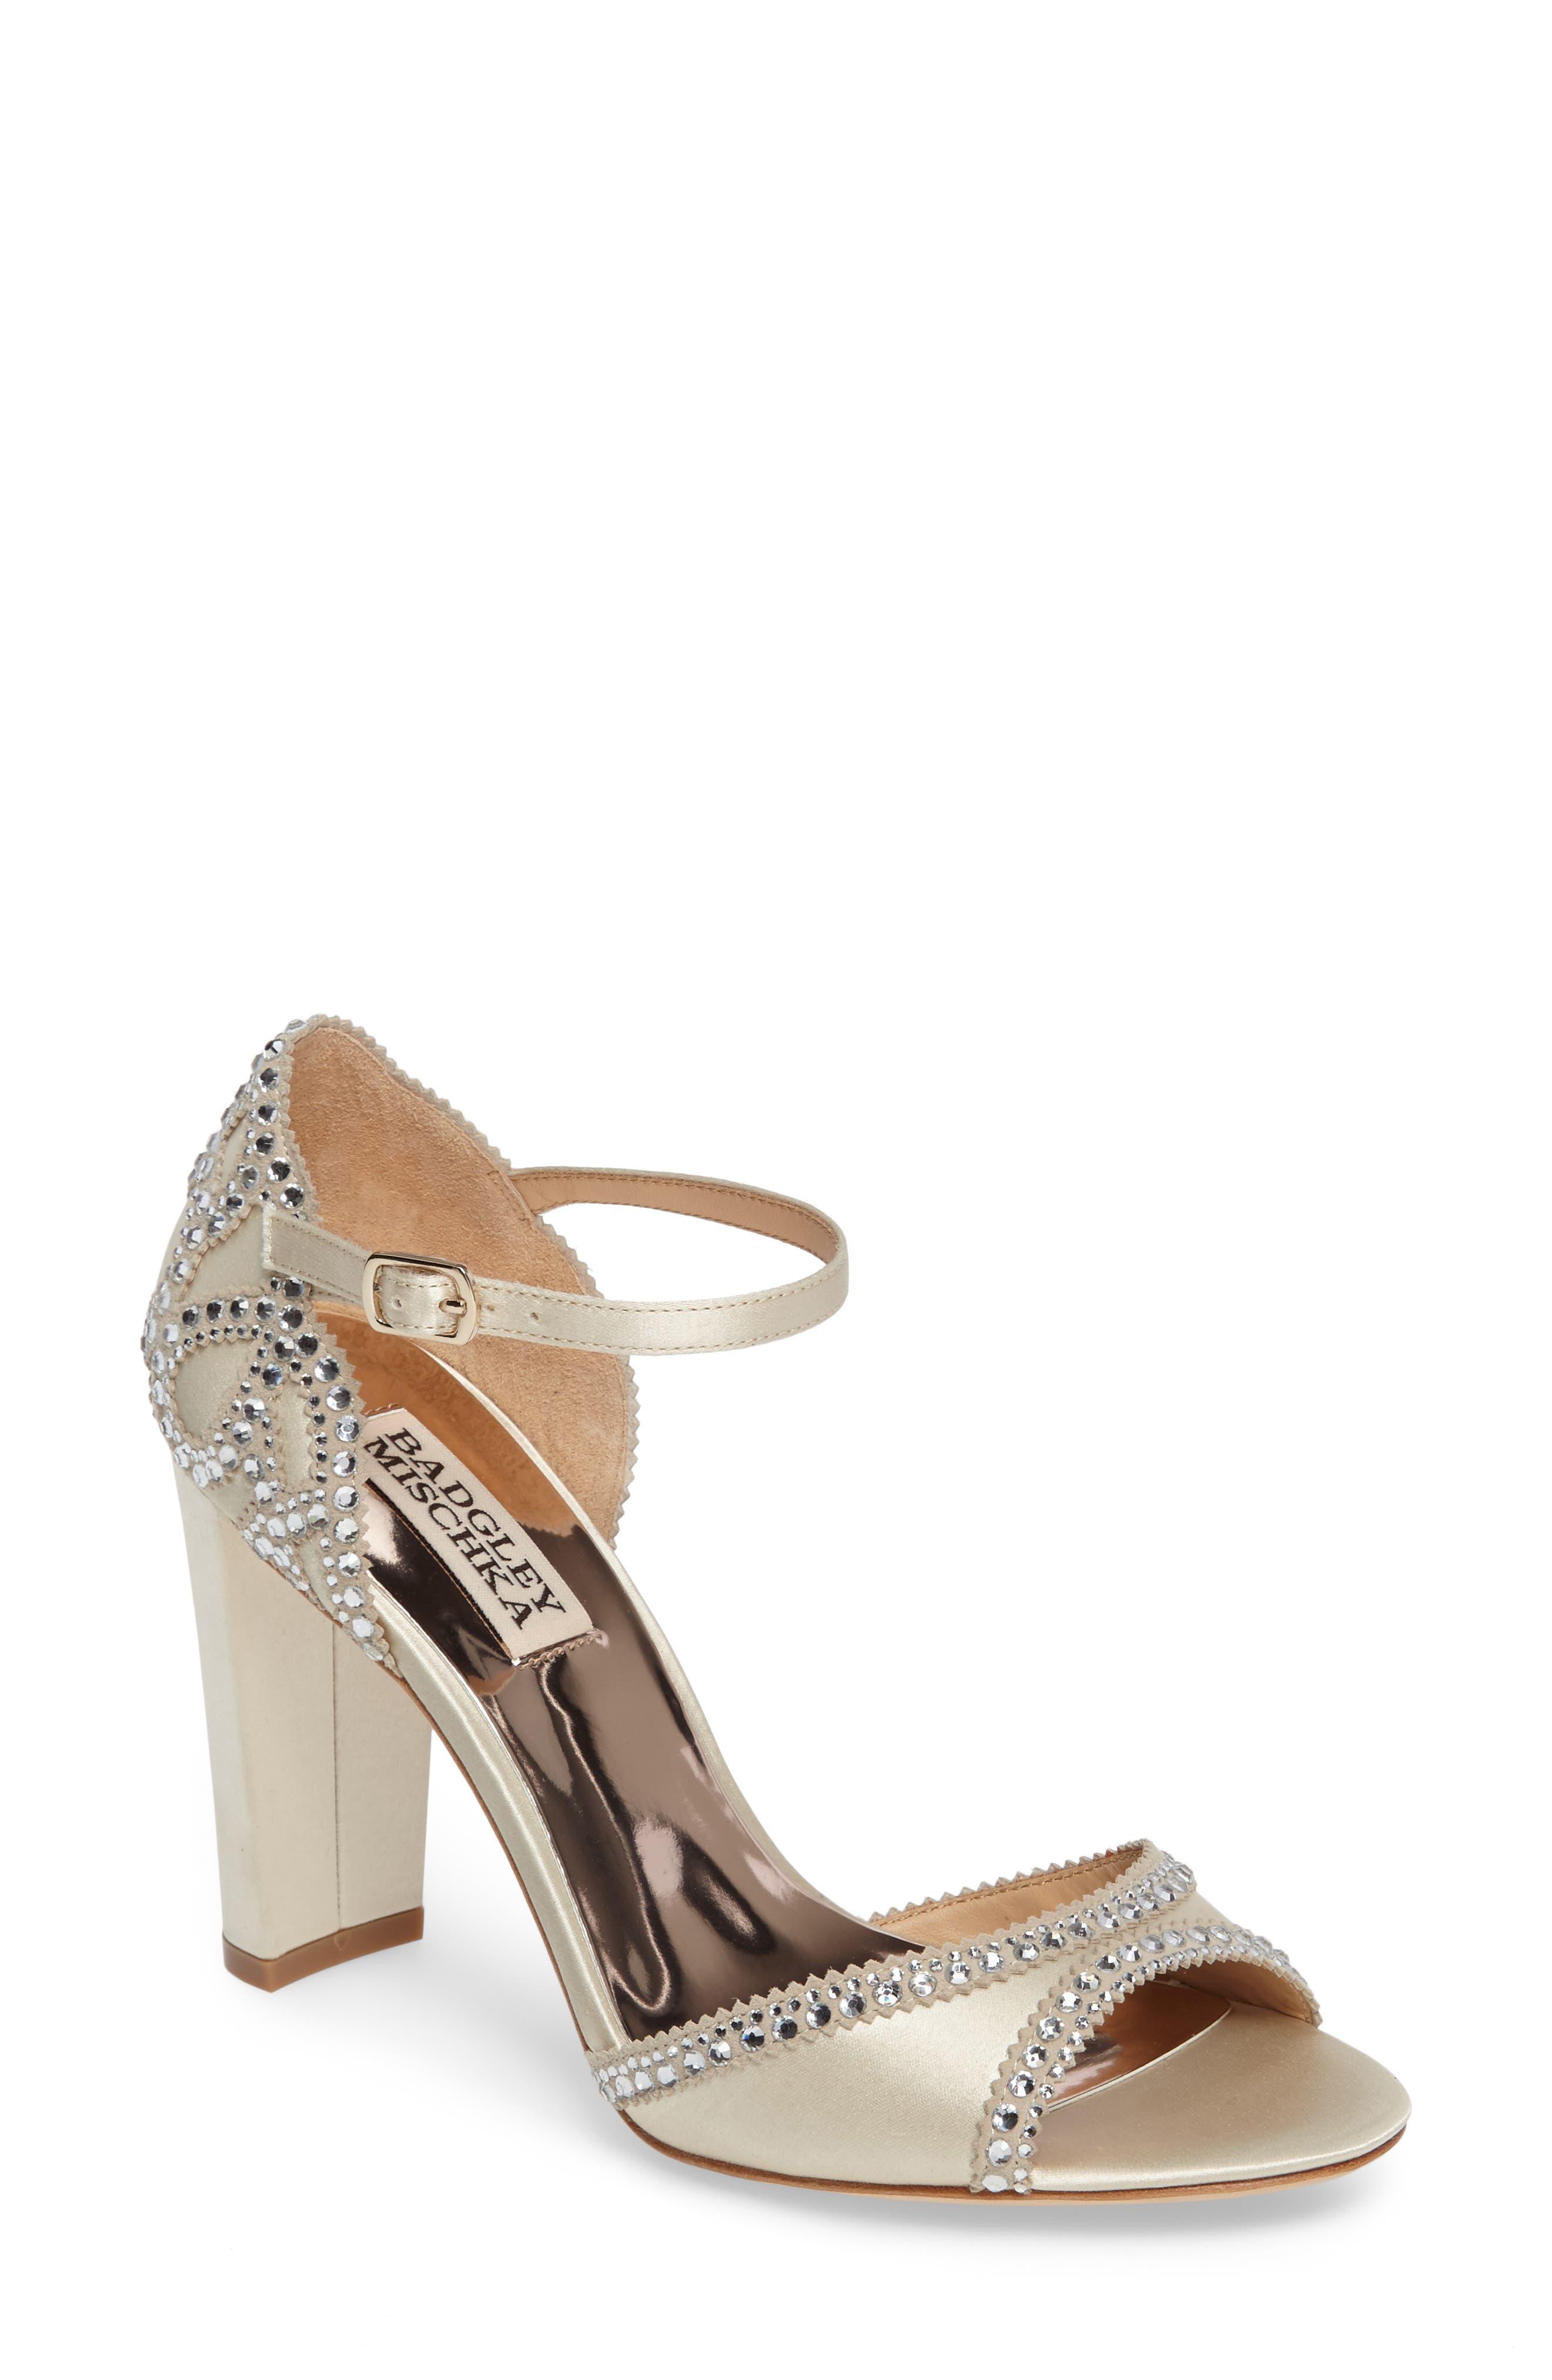 Main Image - Badgley Mischka Kelly Embellished Crescent Heel Sandal (Women)